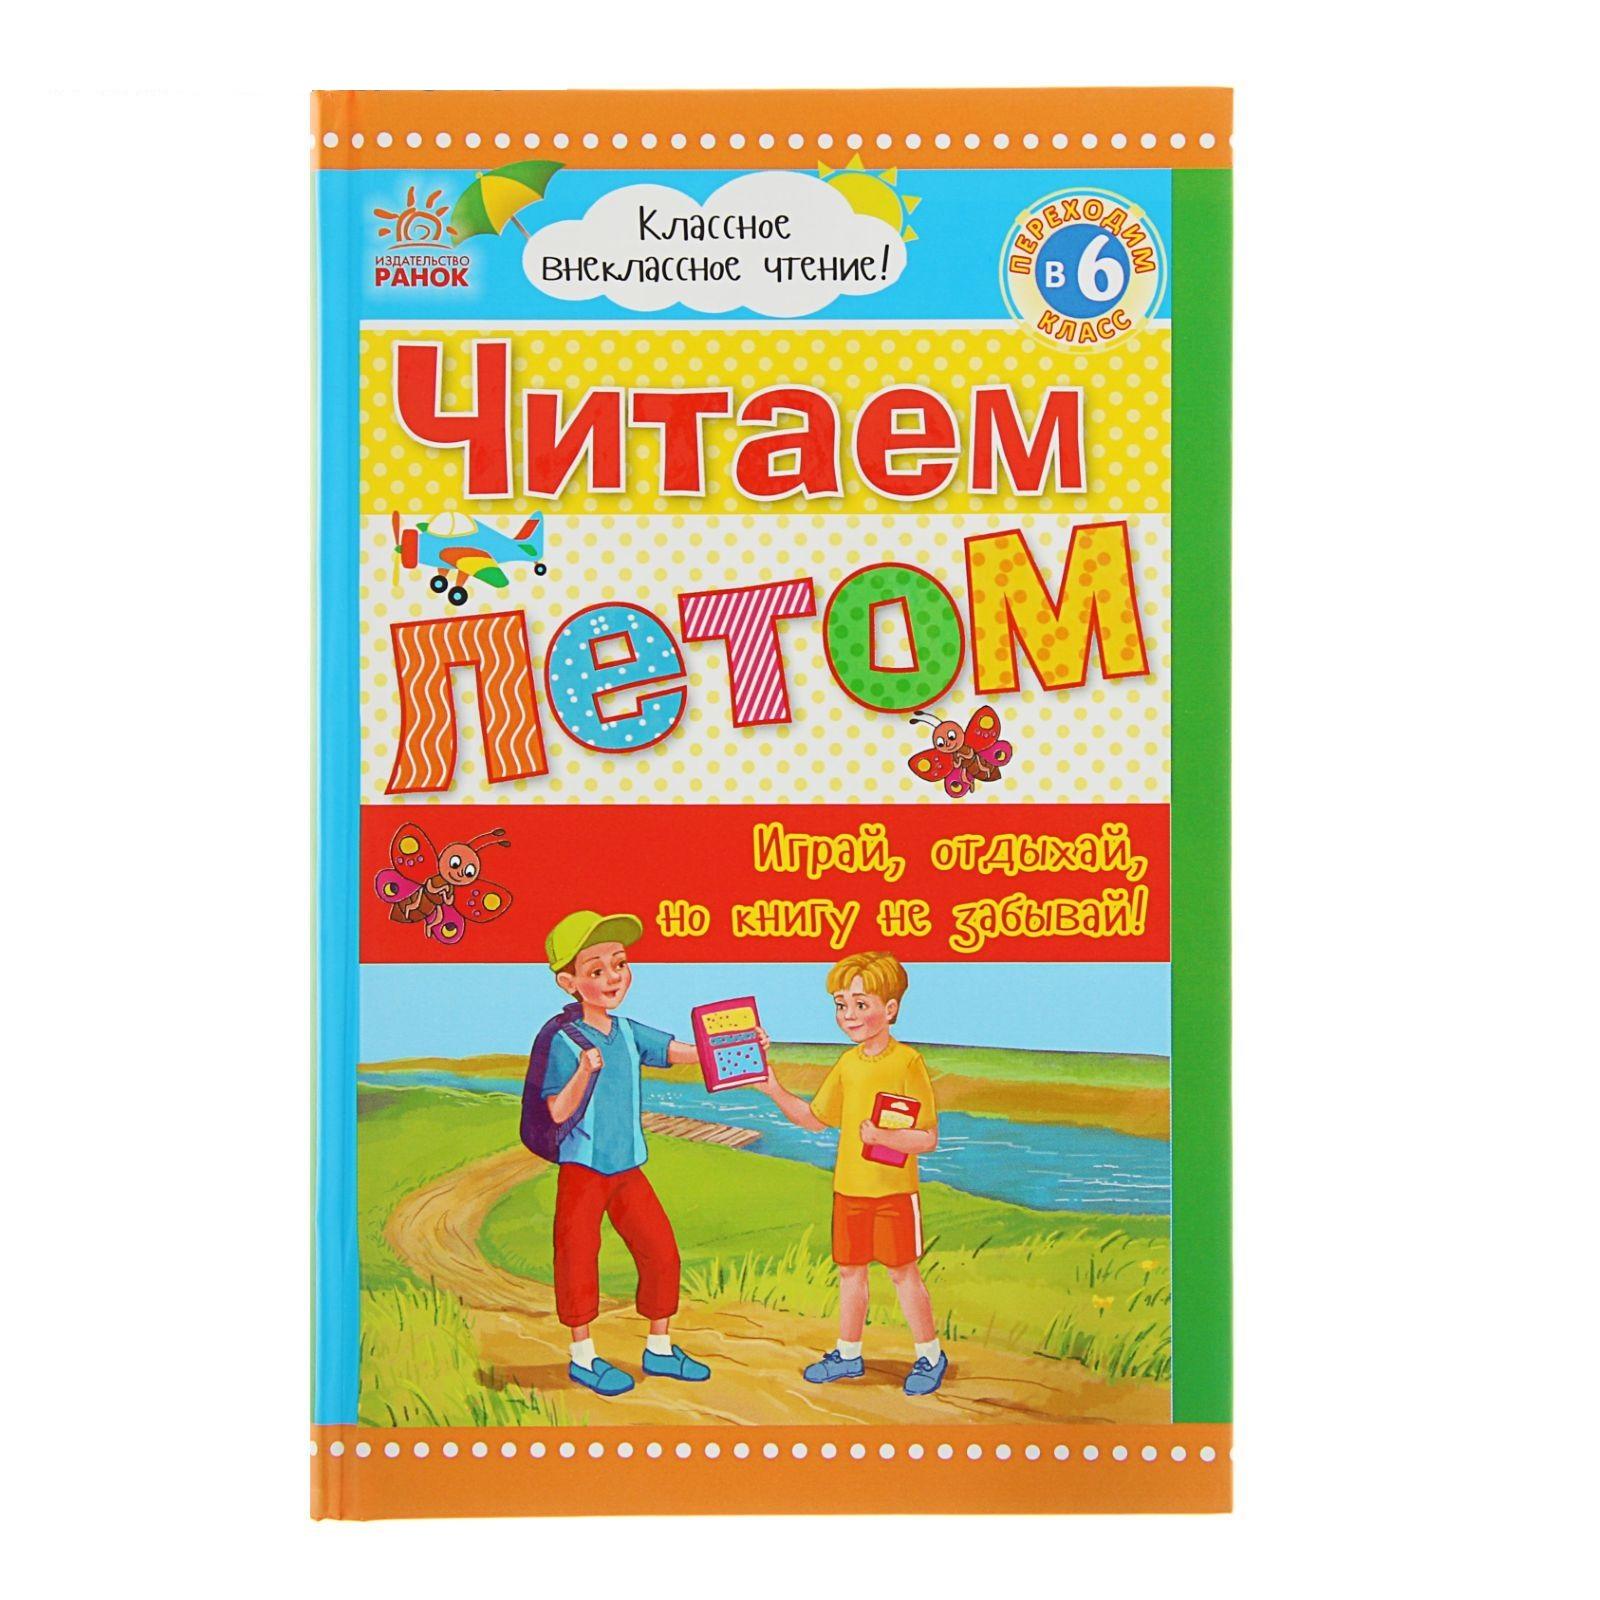 Картинки список книг на лето